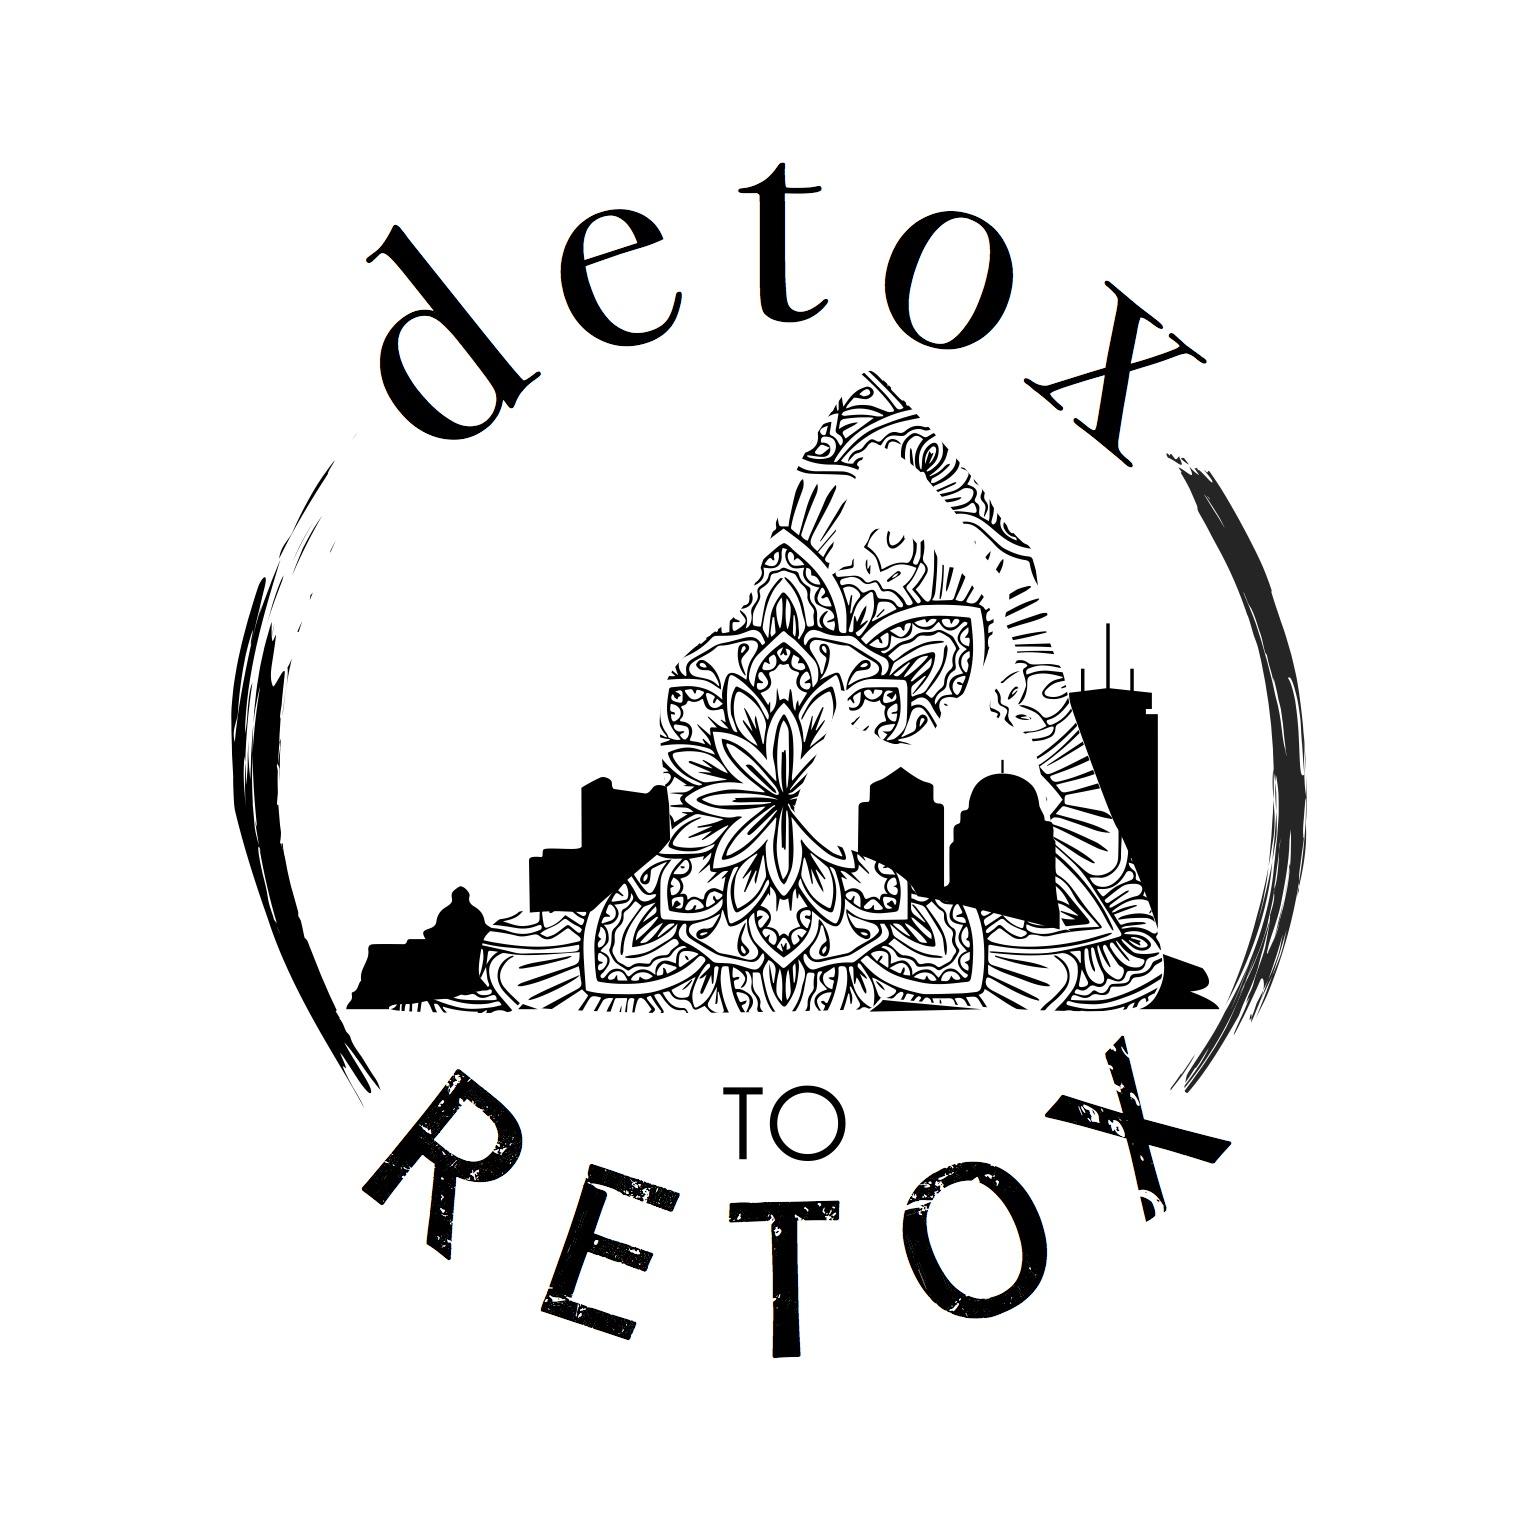 detox_to_retox1.jpg